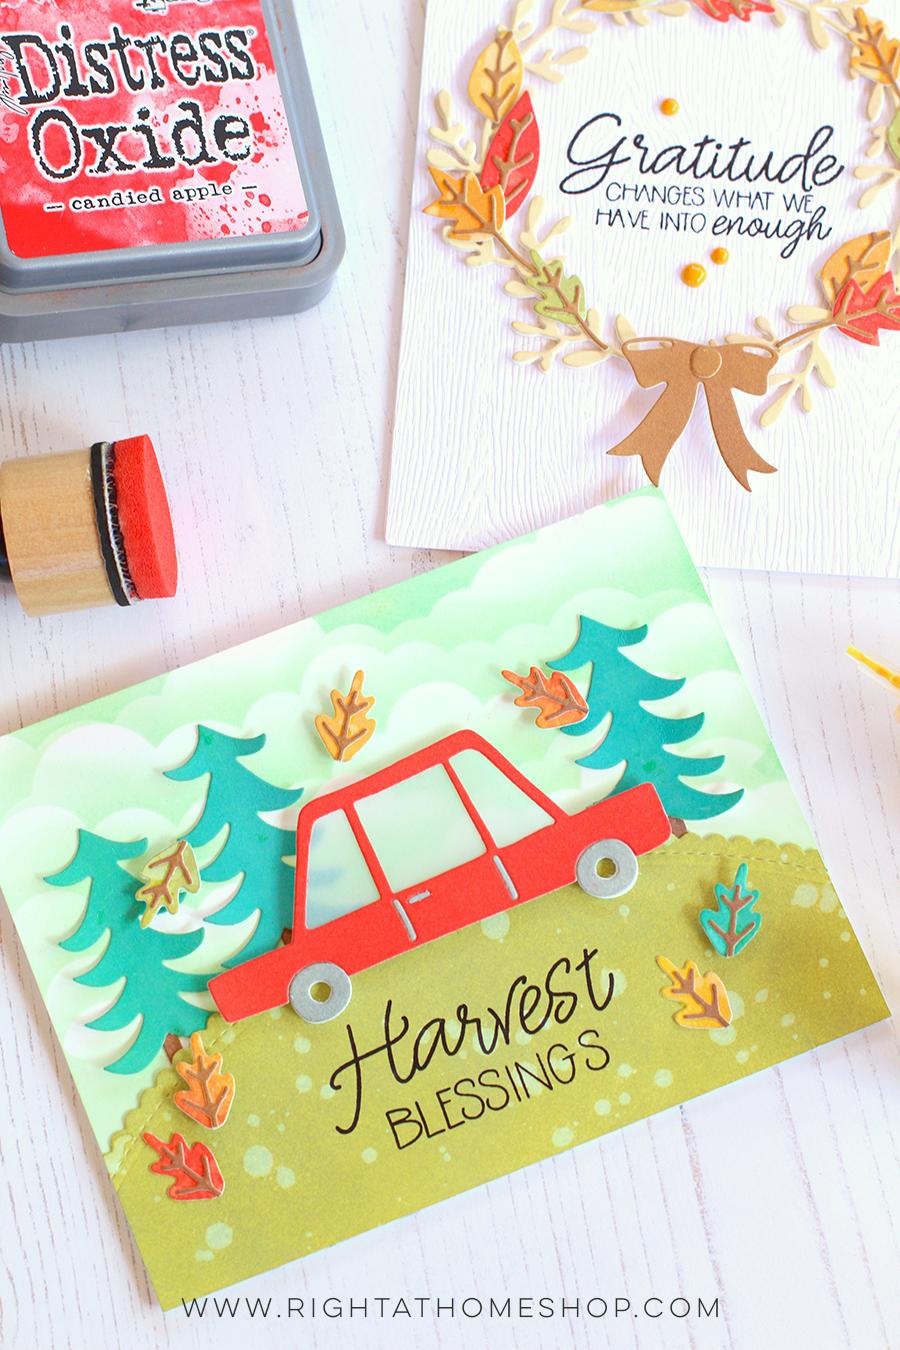 Fall Seasonal Wreath Cards Using Distress Oxide Inks by Nicole // rightathomeshop.com/blog